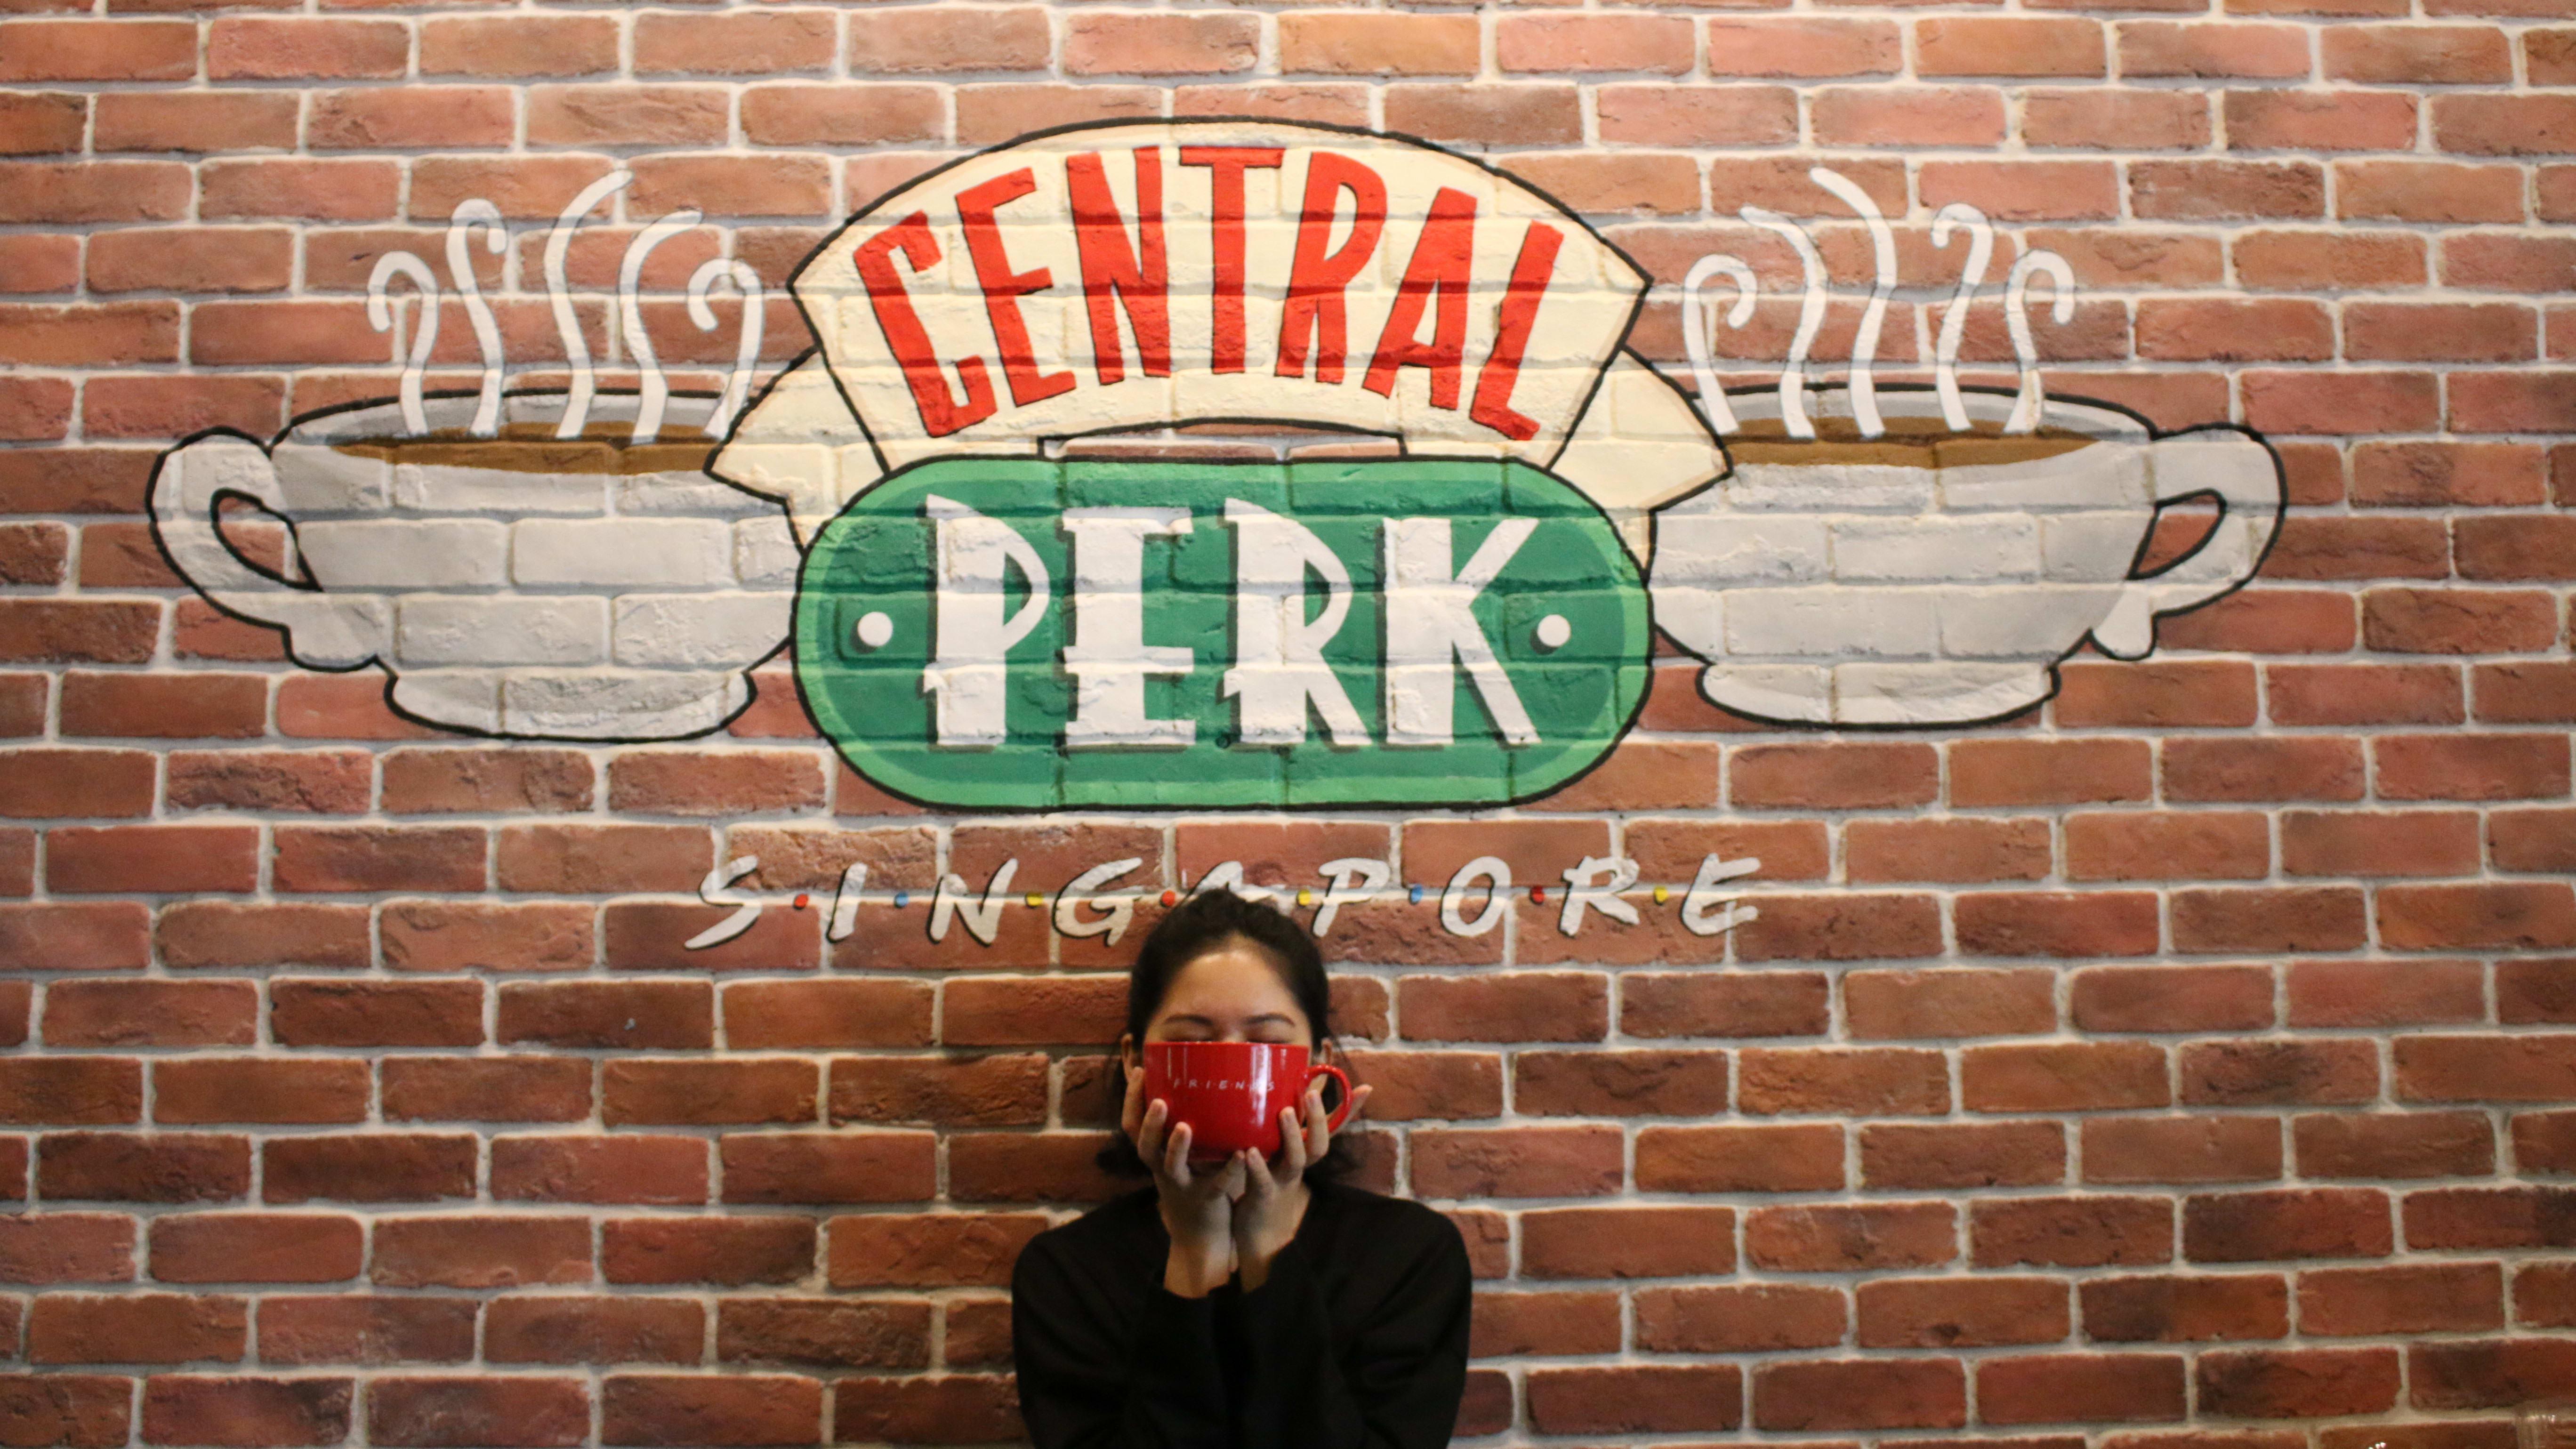 central perk singapore